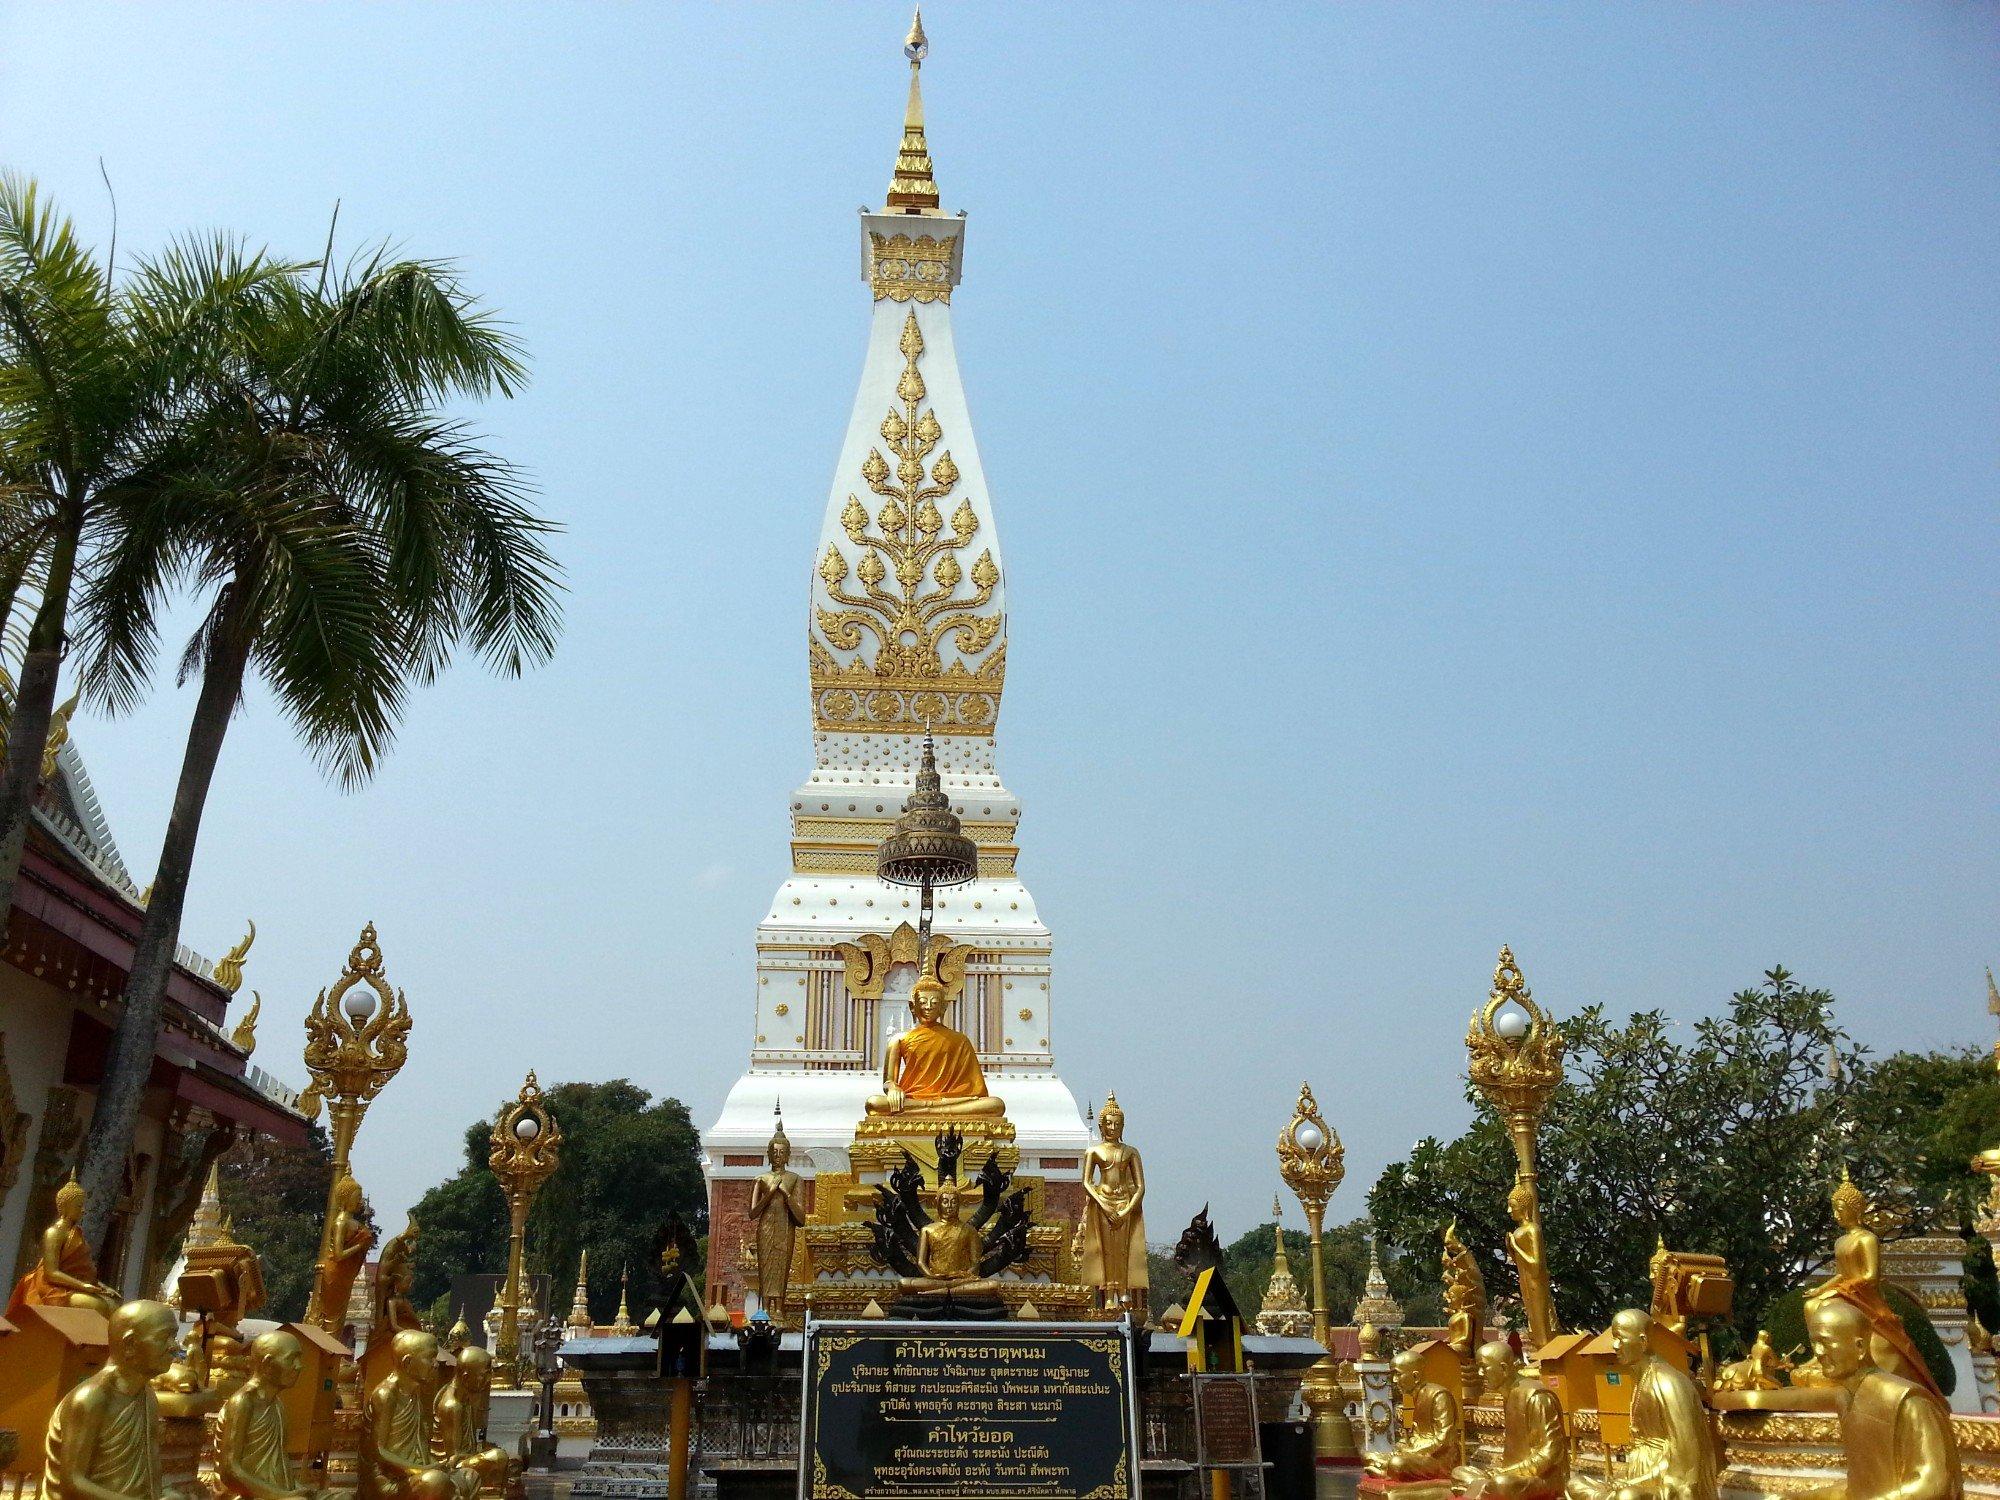 Wat Phra That Phanom near Nakhon Phanom